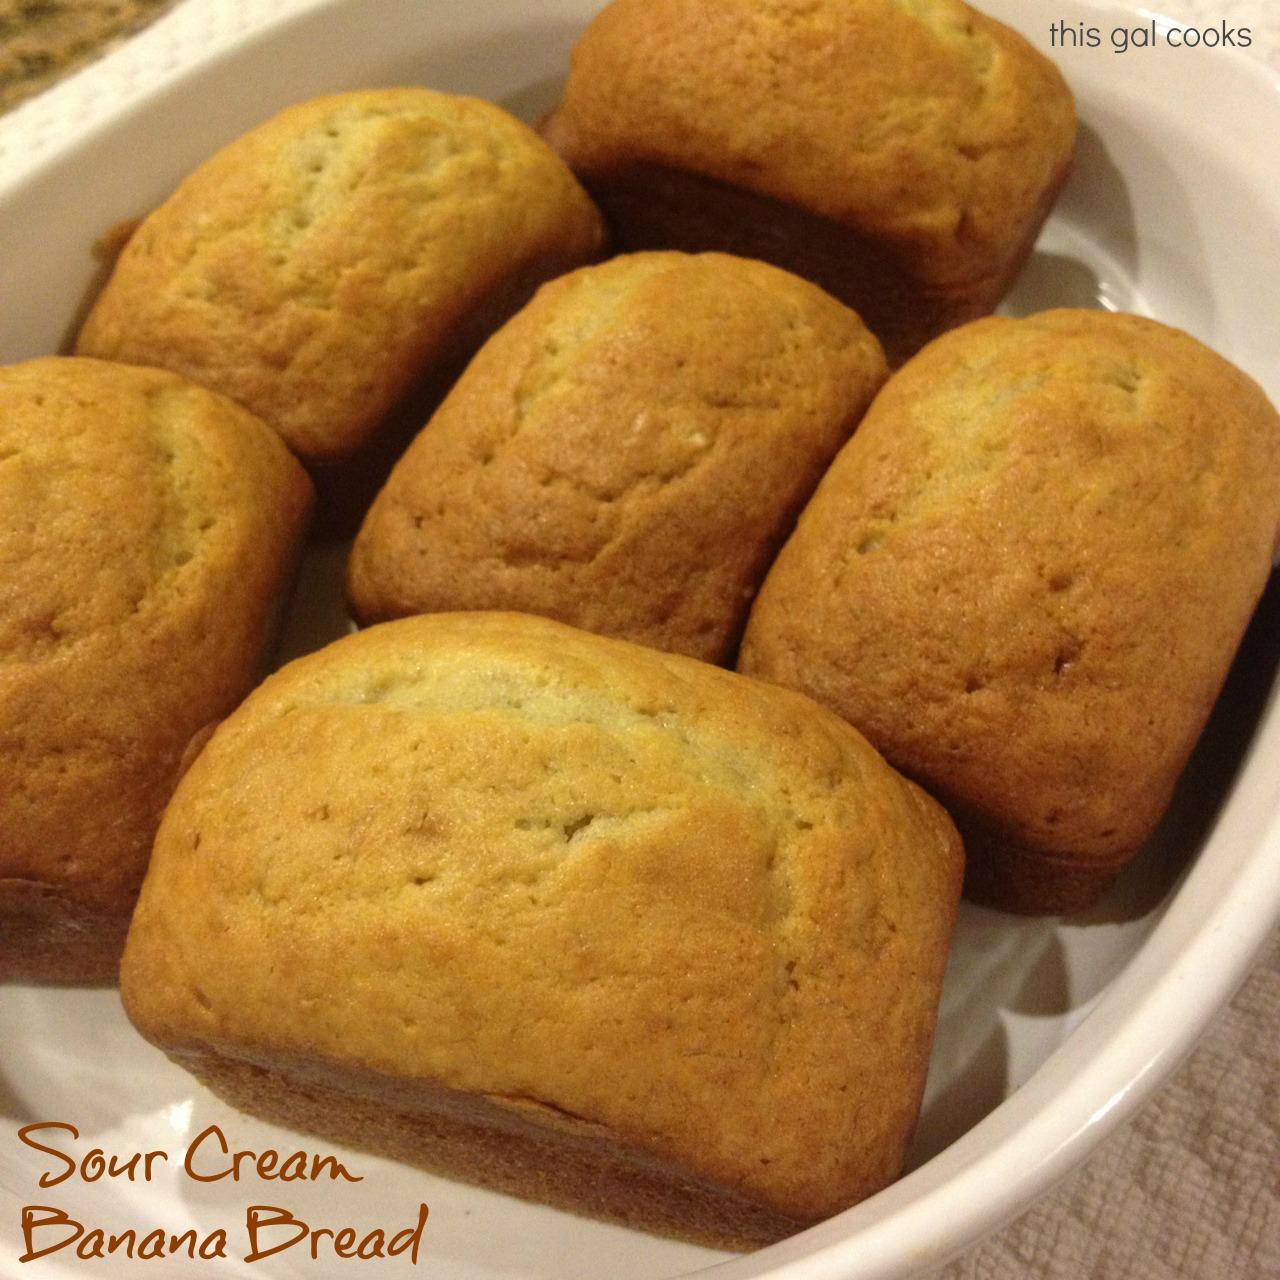 Sour Cream Banana Bread | This Gal Cooks